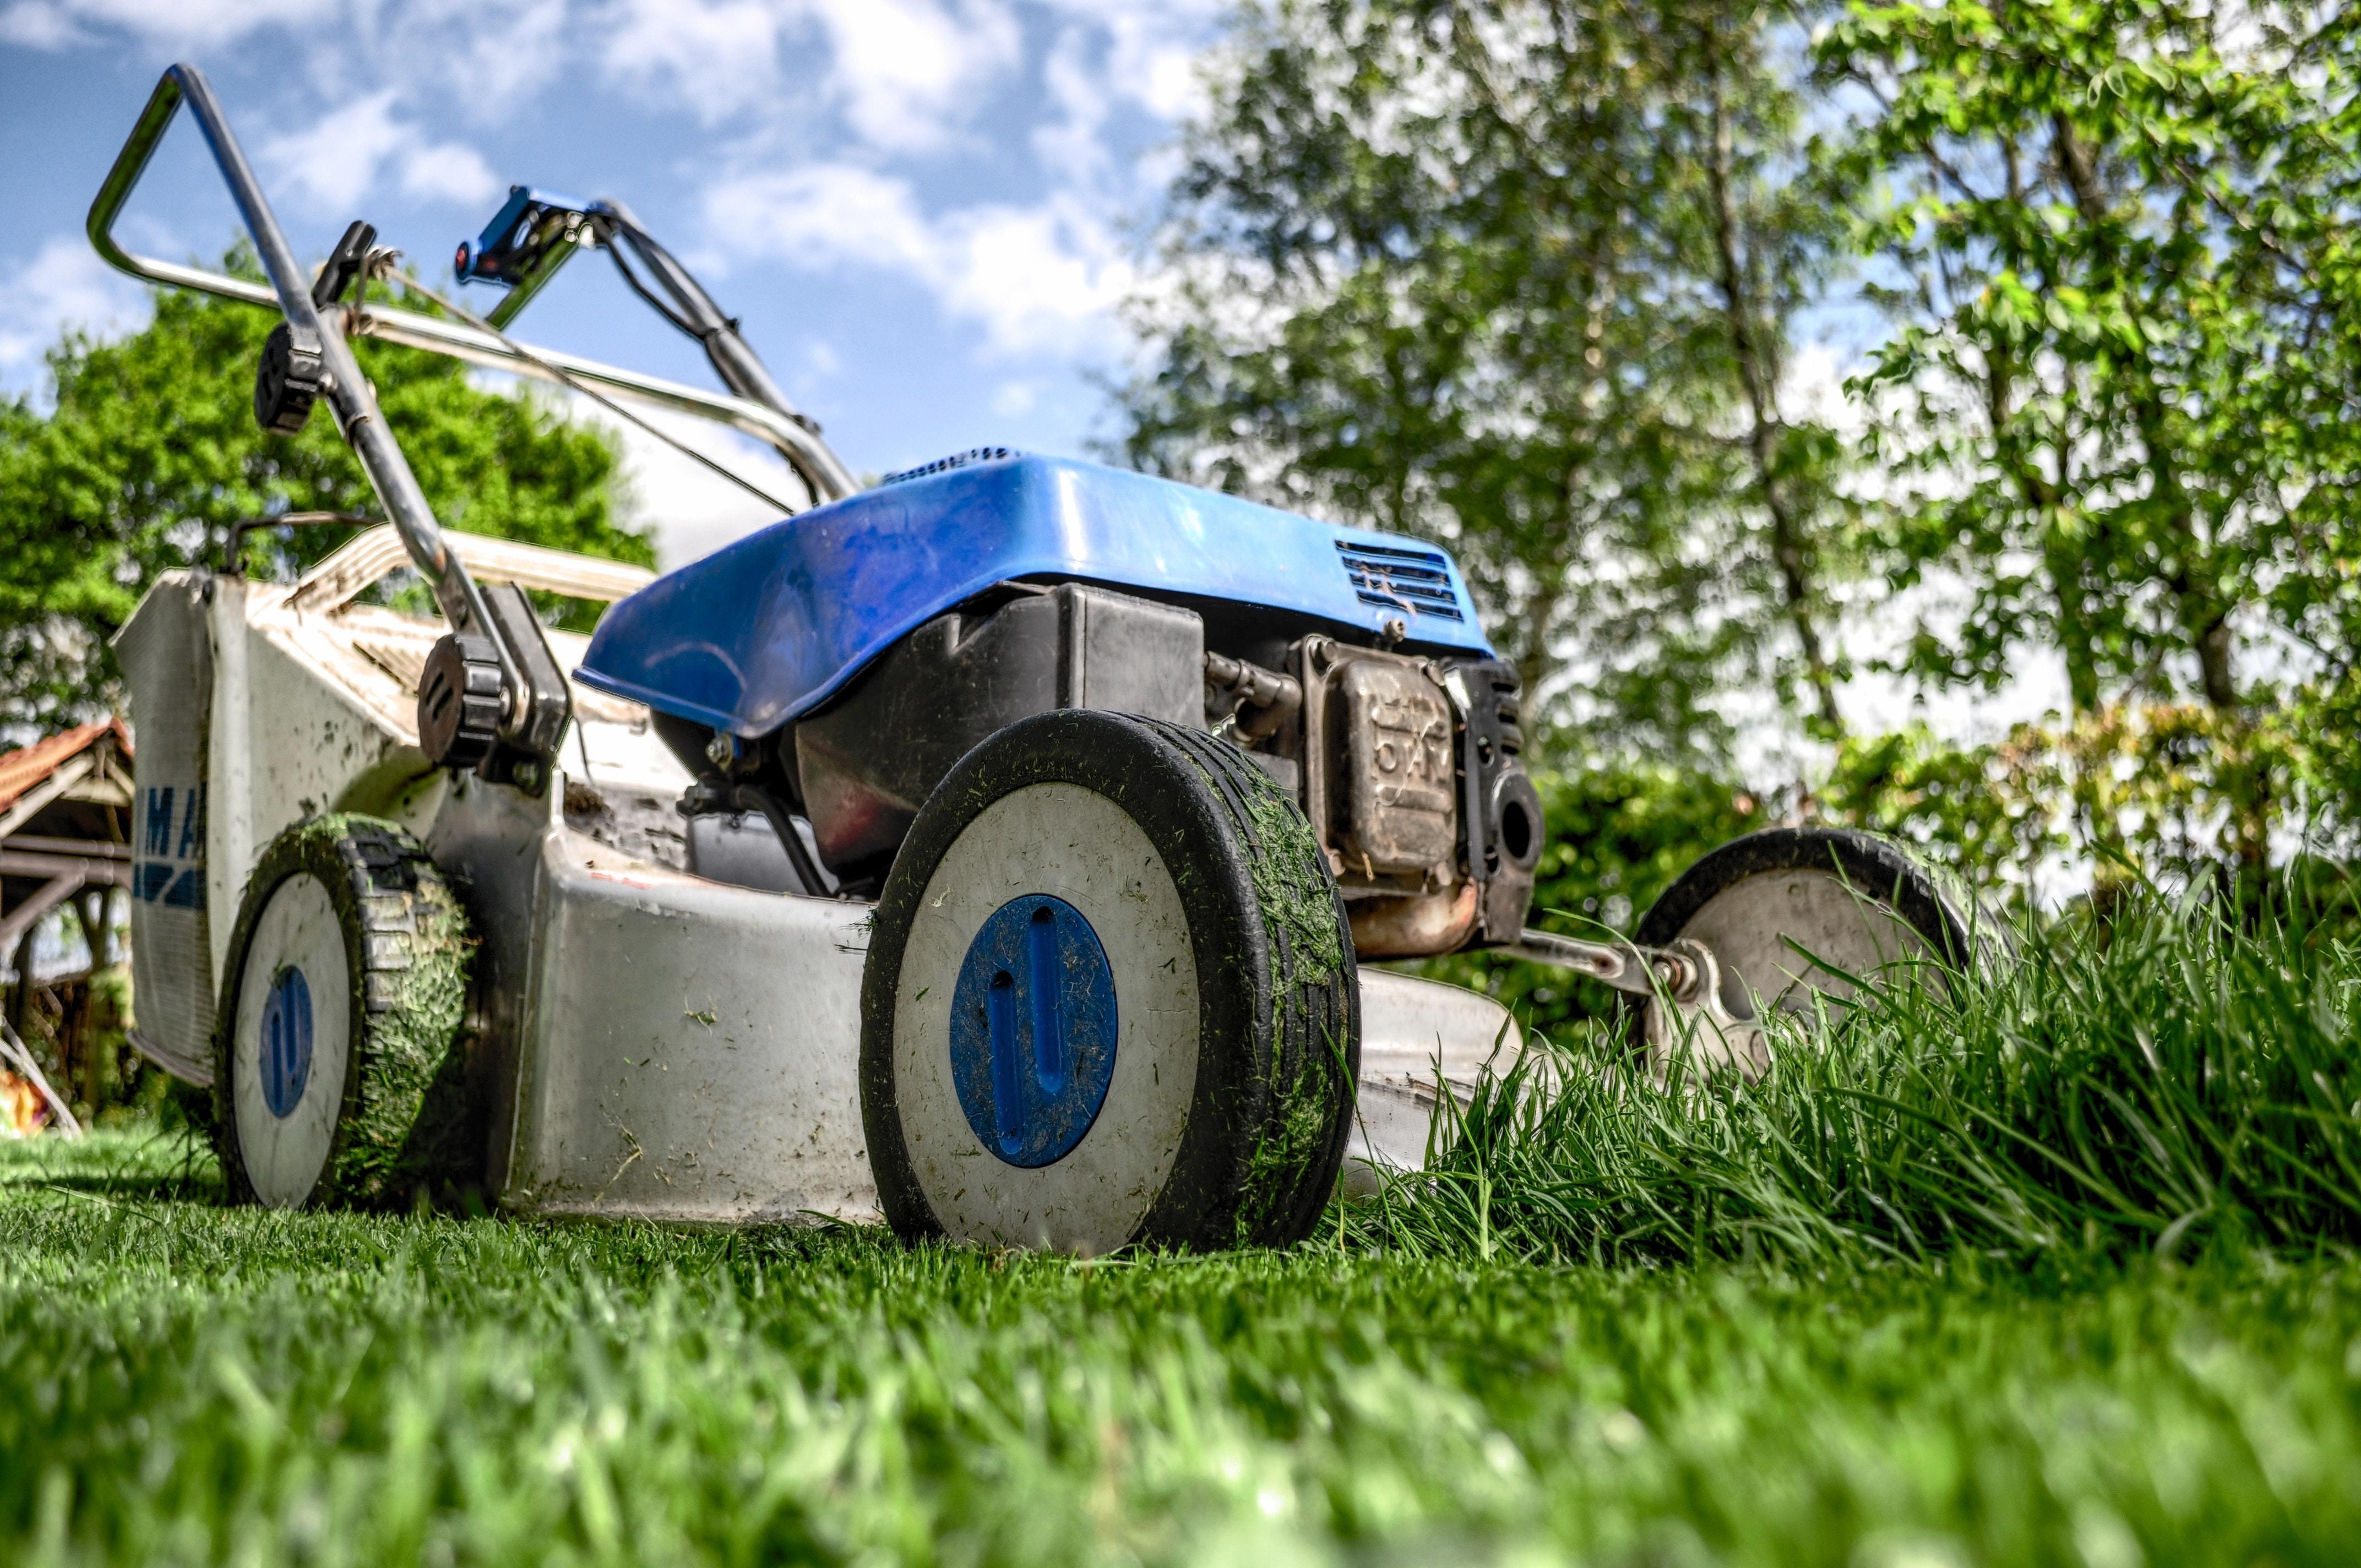 lawnmower mowing grass